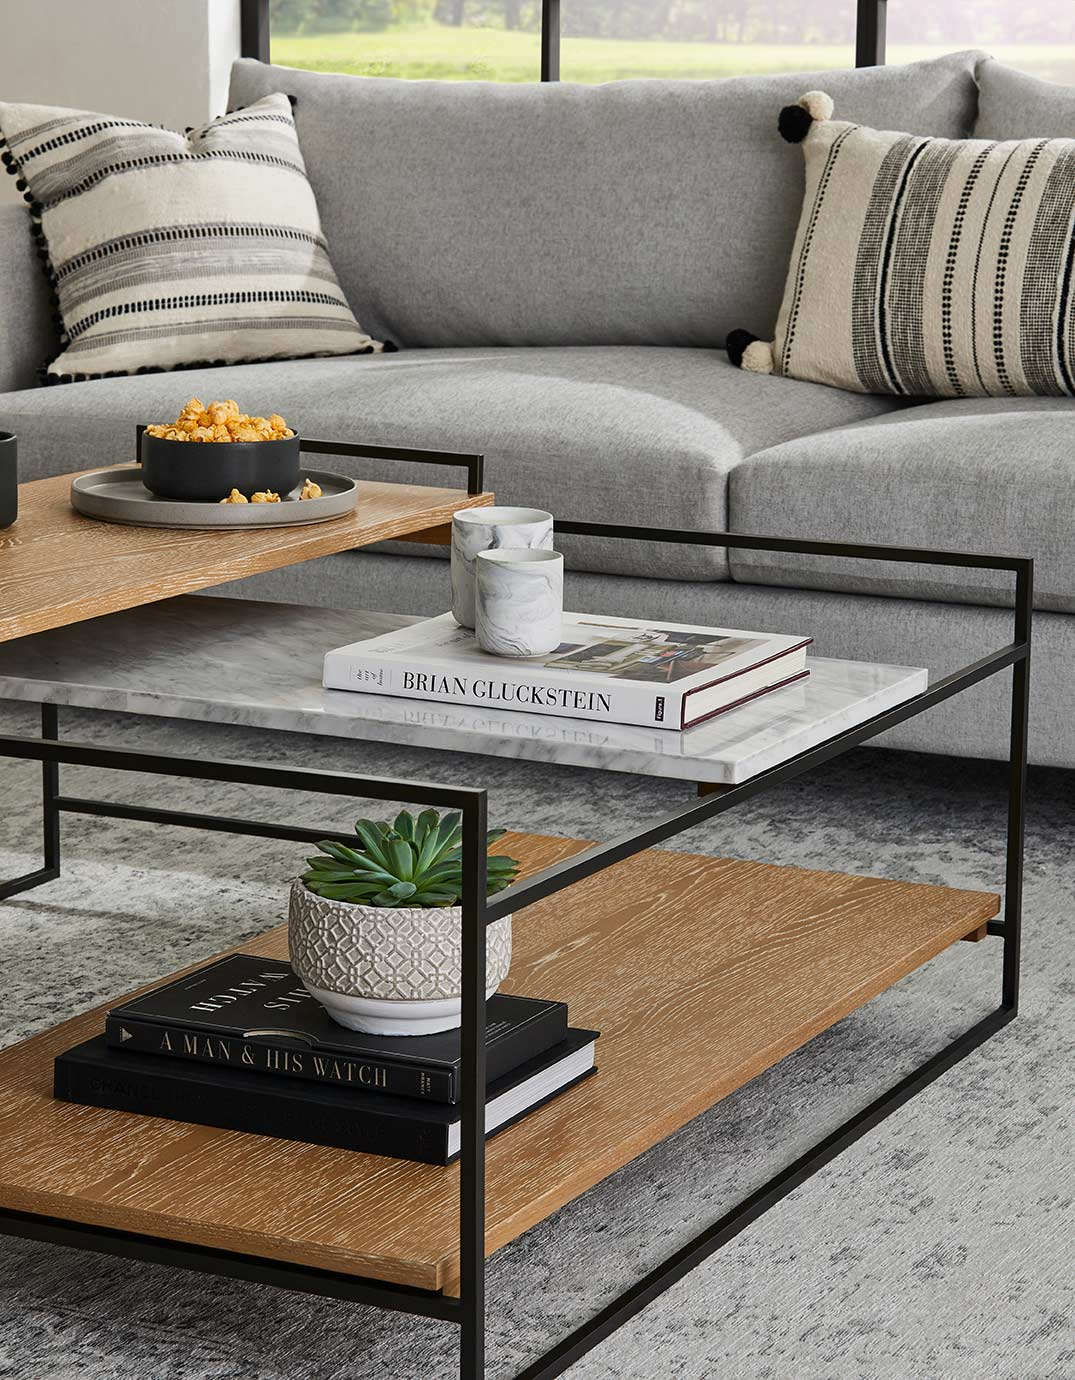 GlucksteinHome | Living Room Details